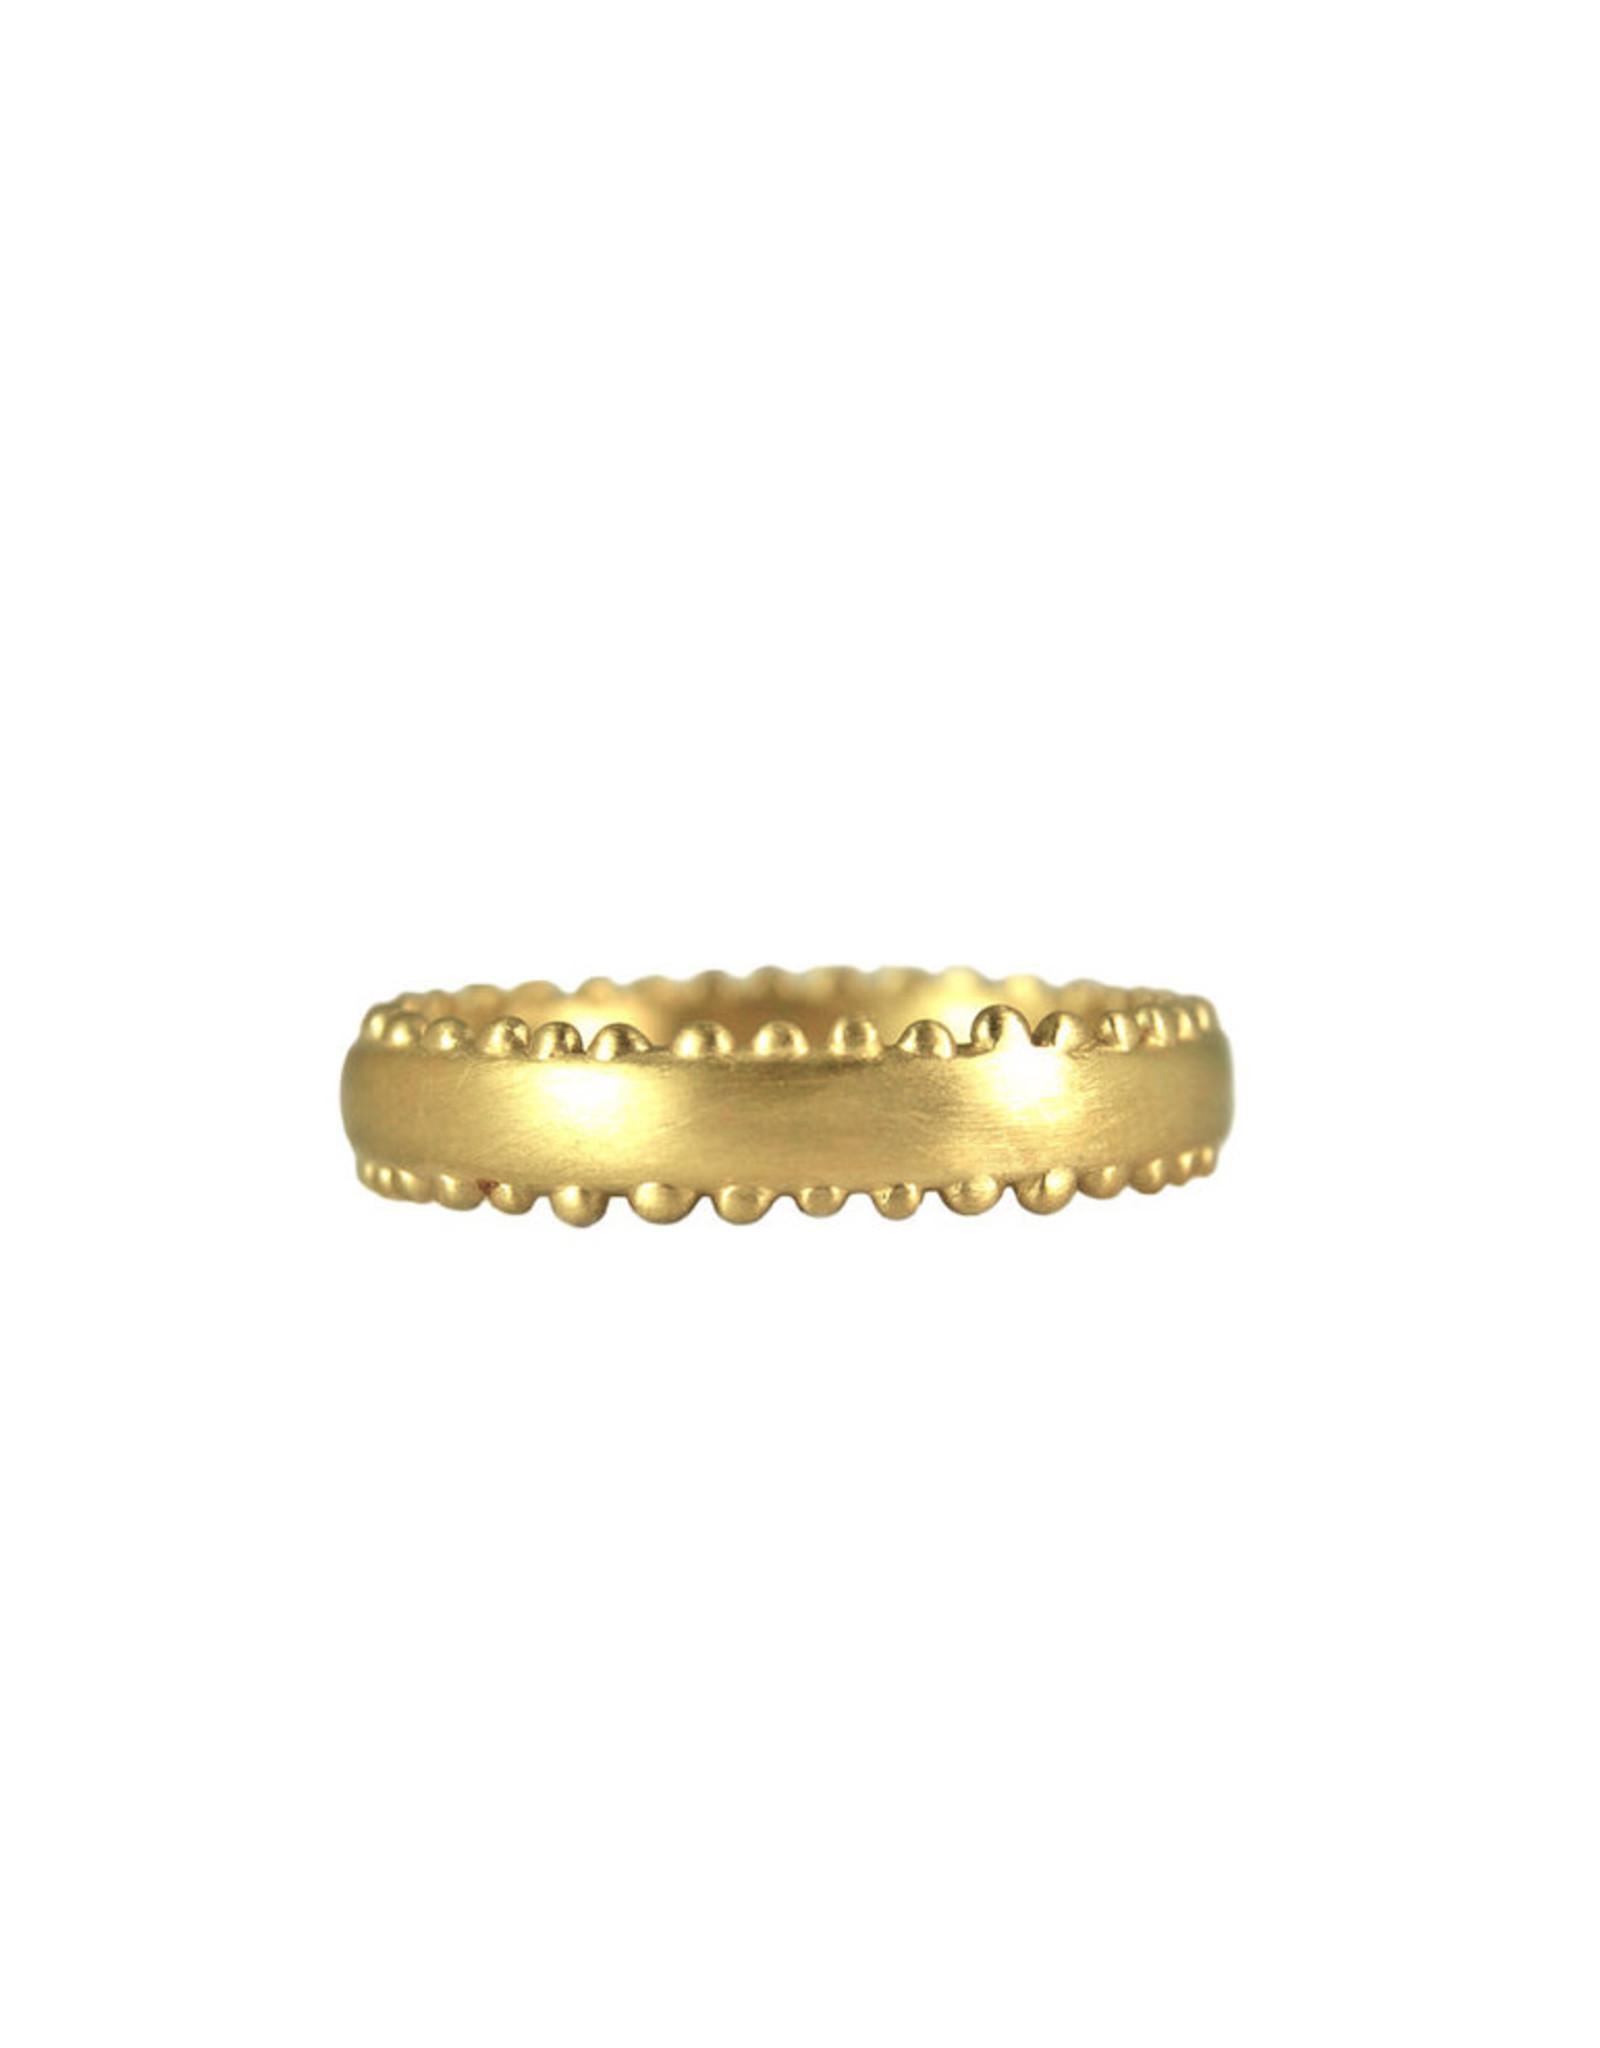 Lorak Jewelry Thin Beaded Jude Band - Sz. 6